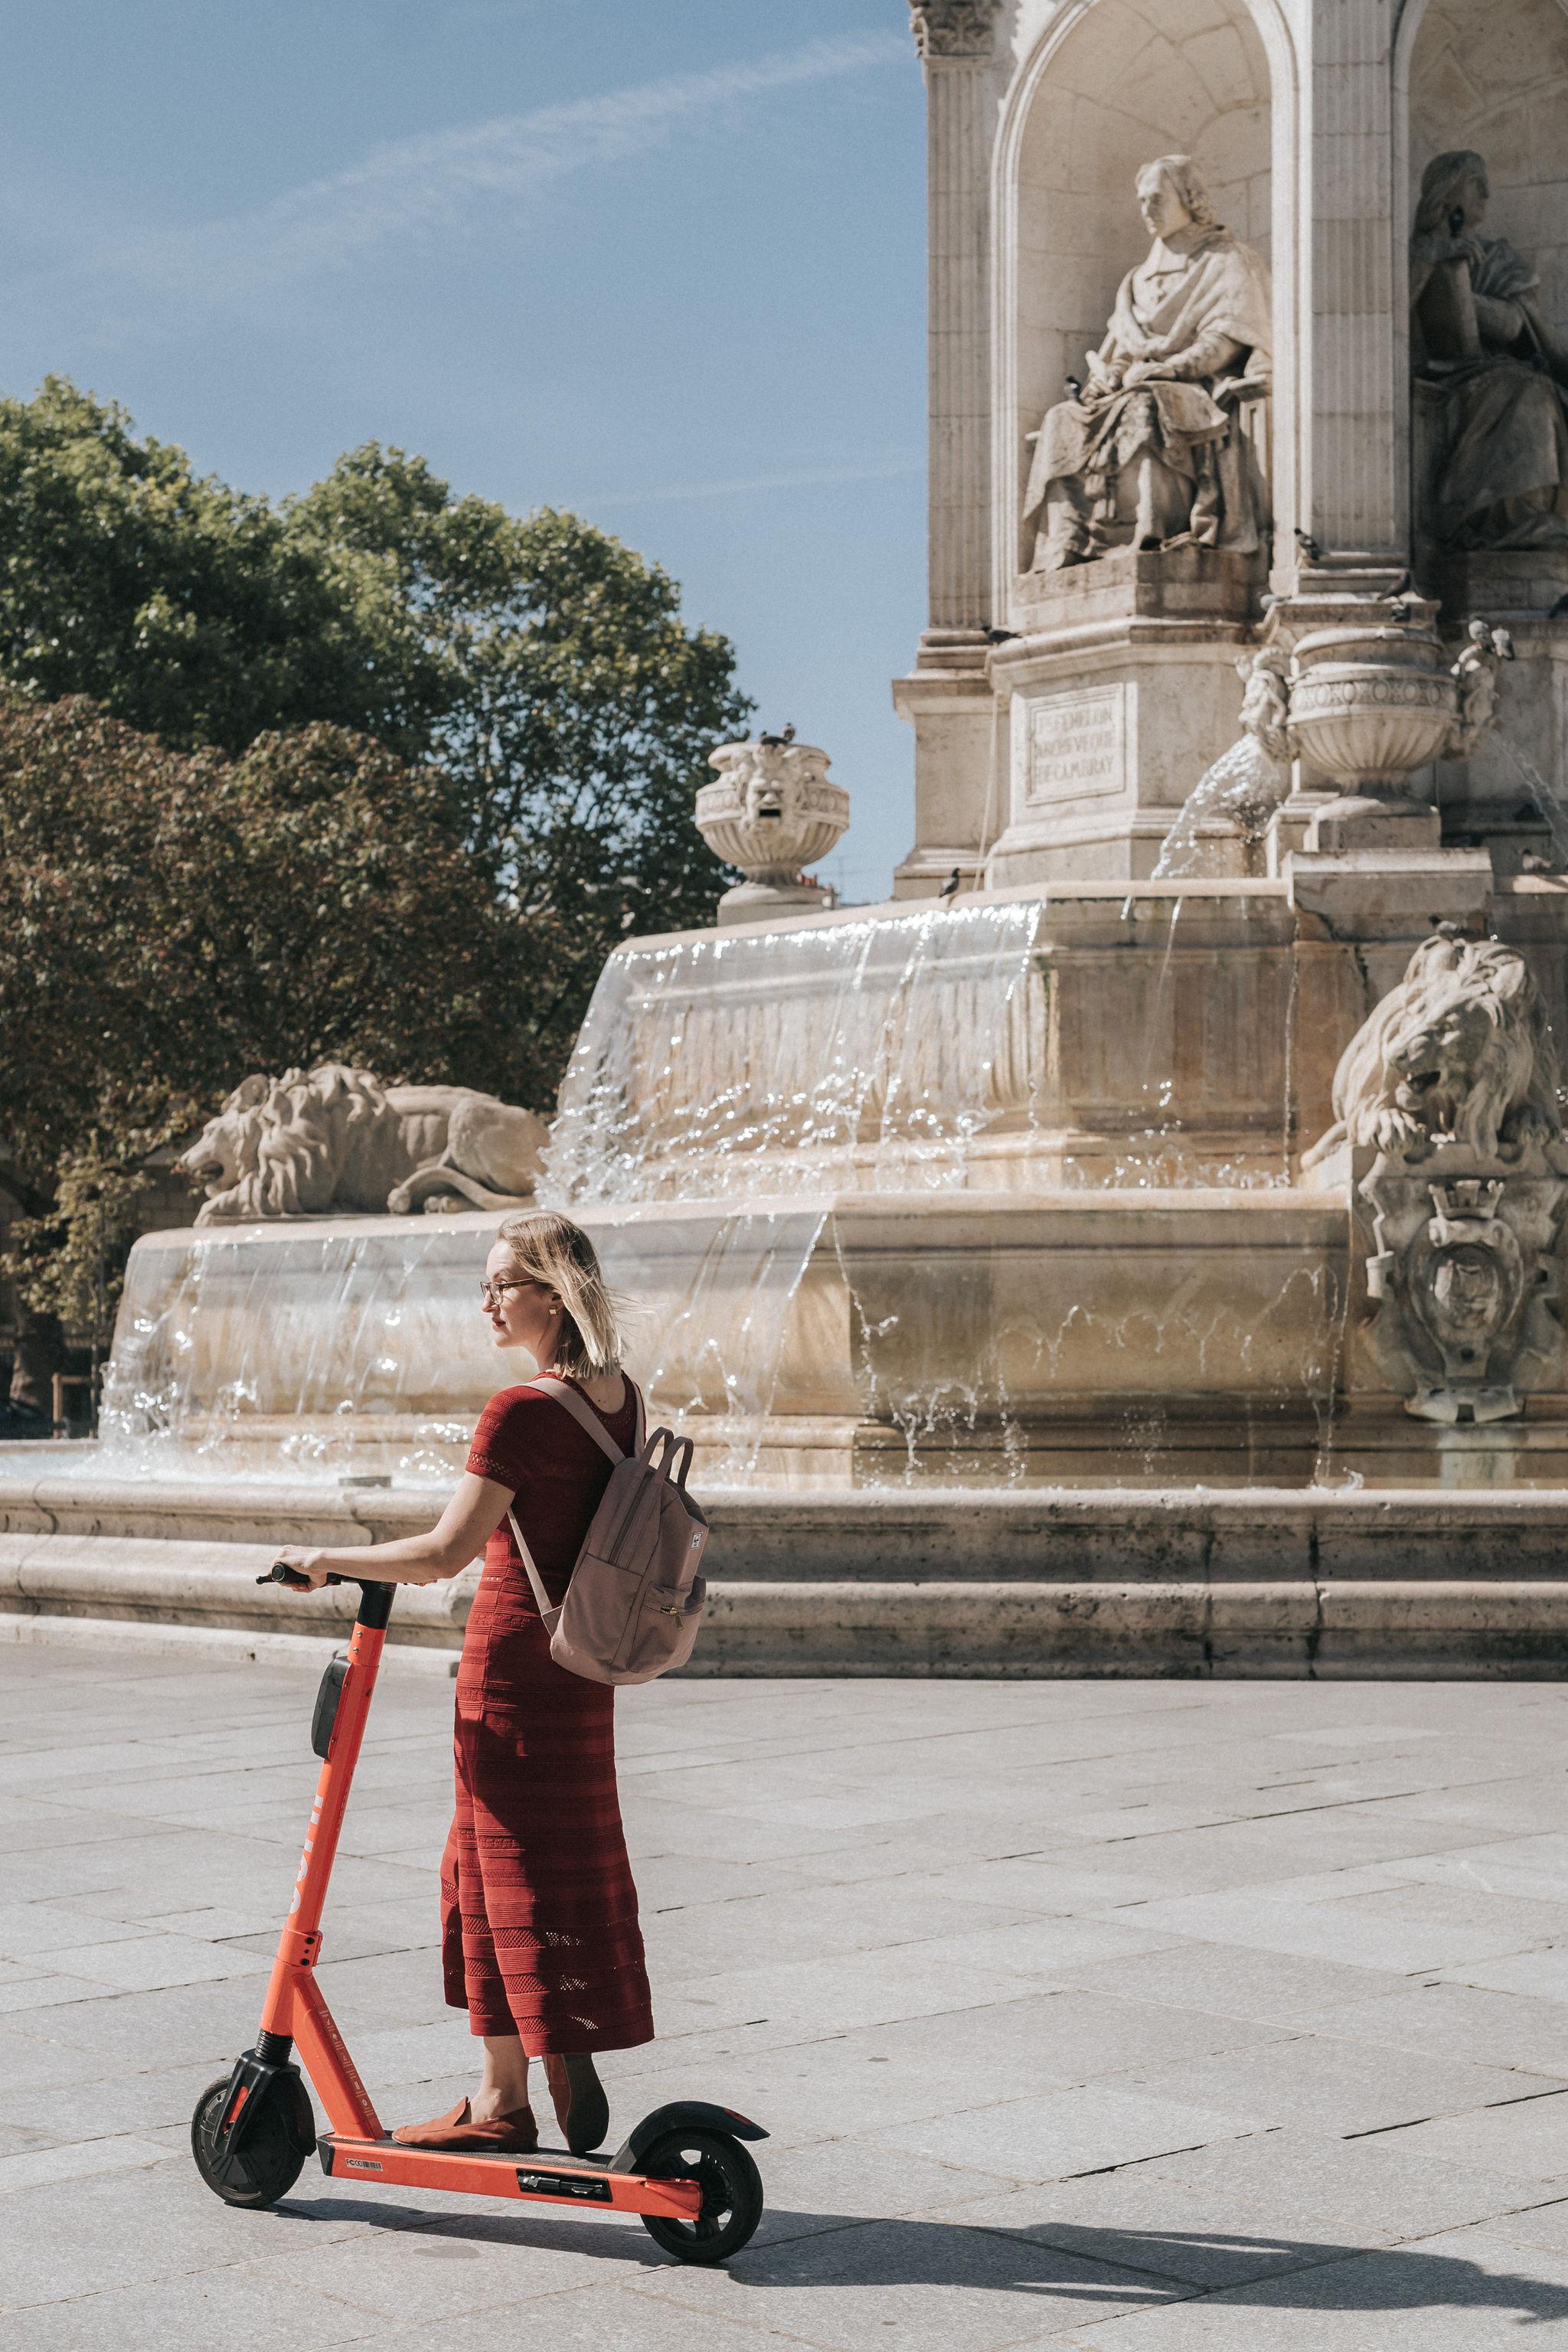 Scooter Review Jump by Paris Photographer Iheartparisfr.jpg